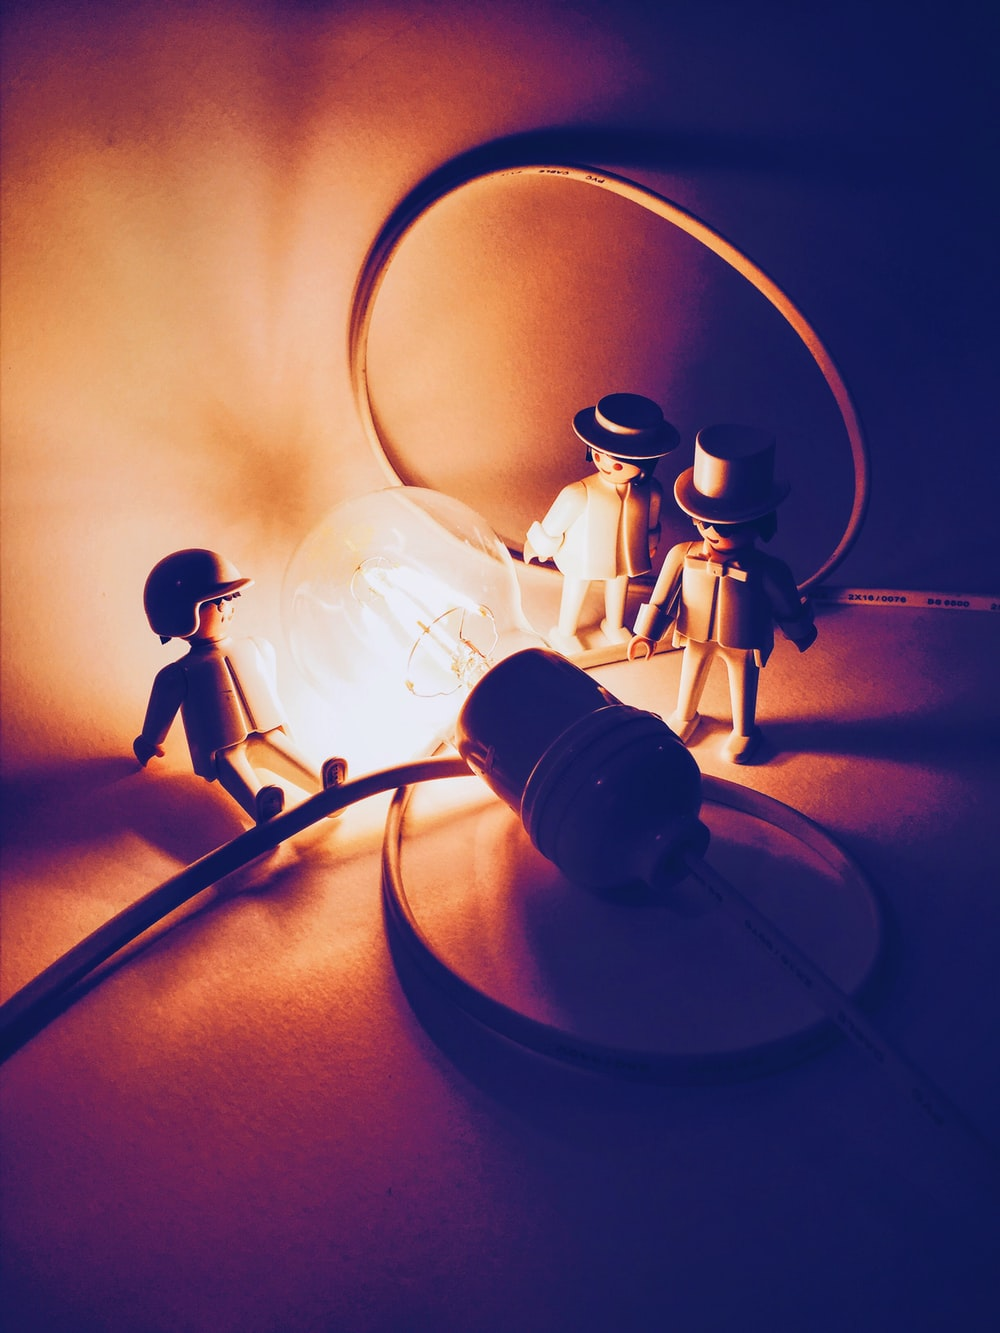 selective focus photography of three men figurines near lighted light bulb